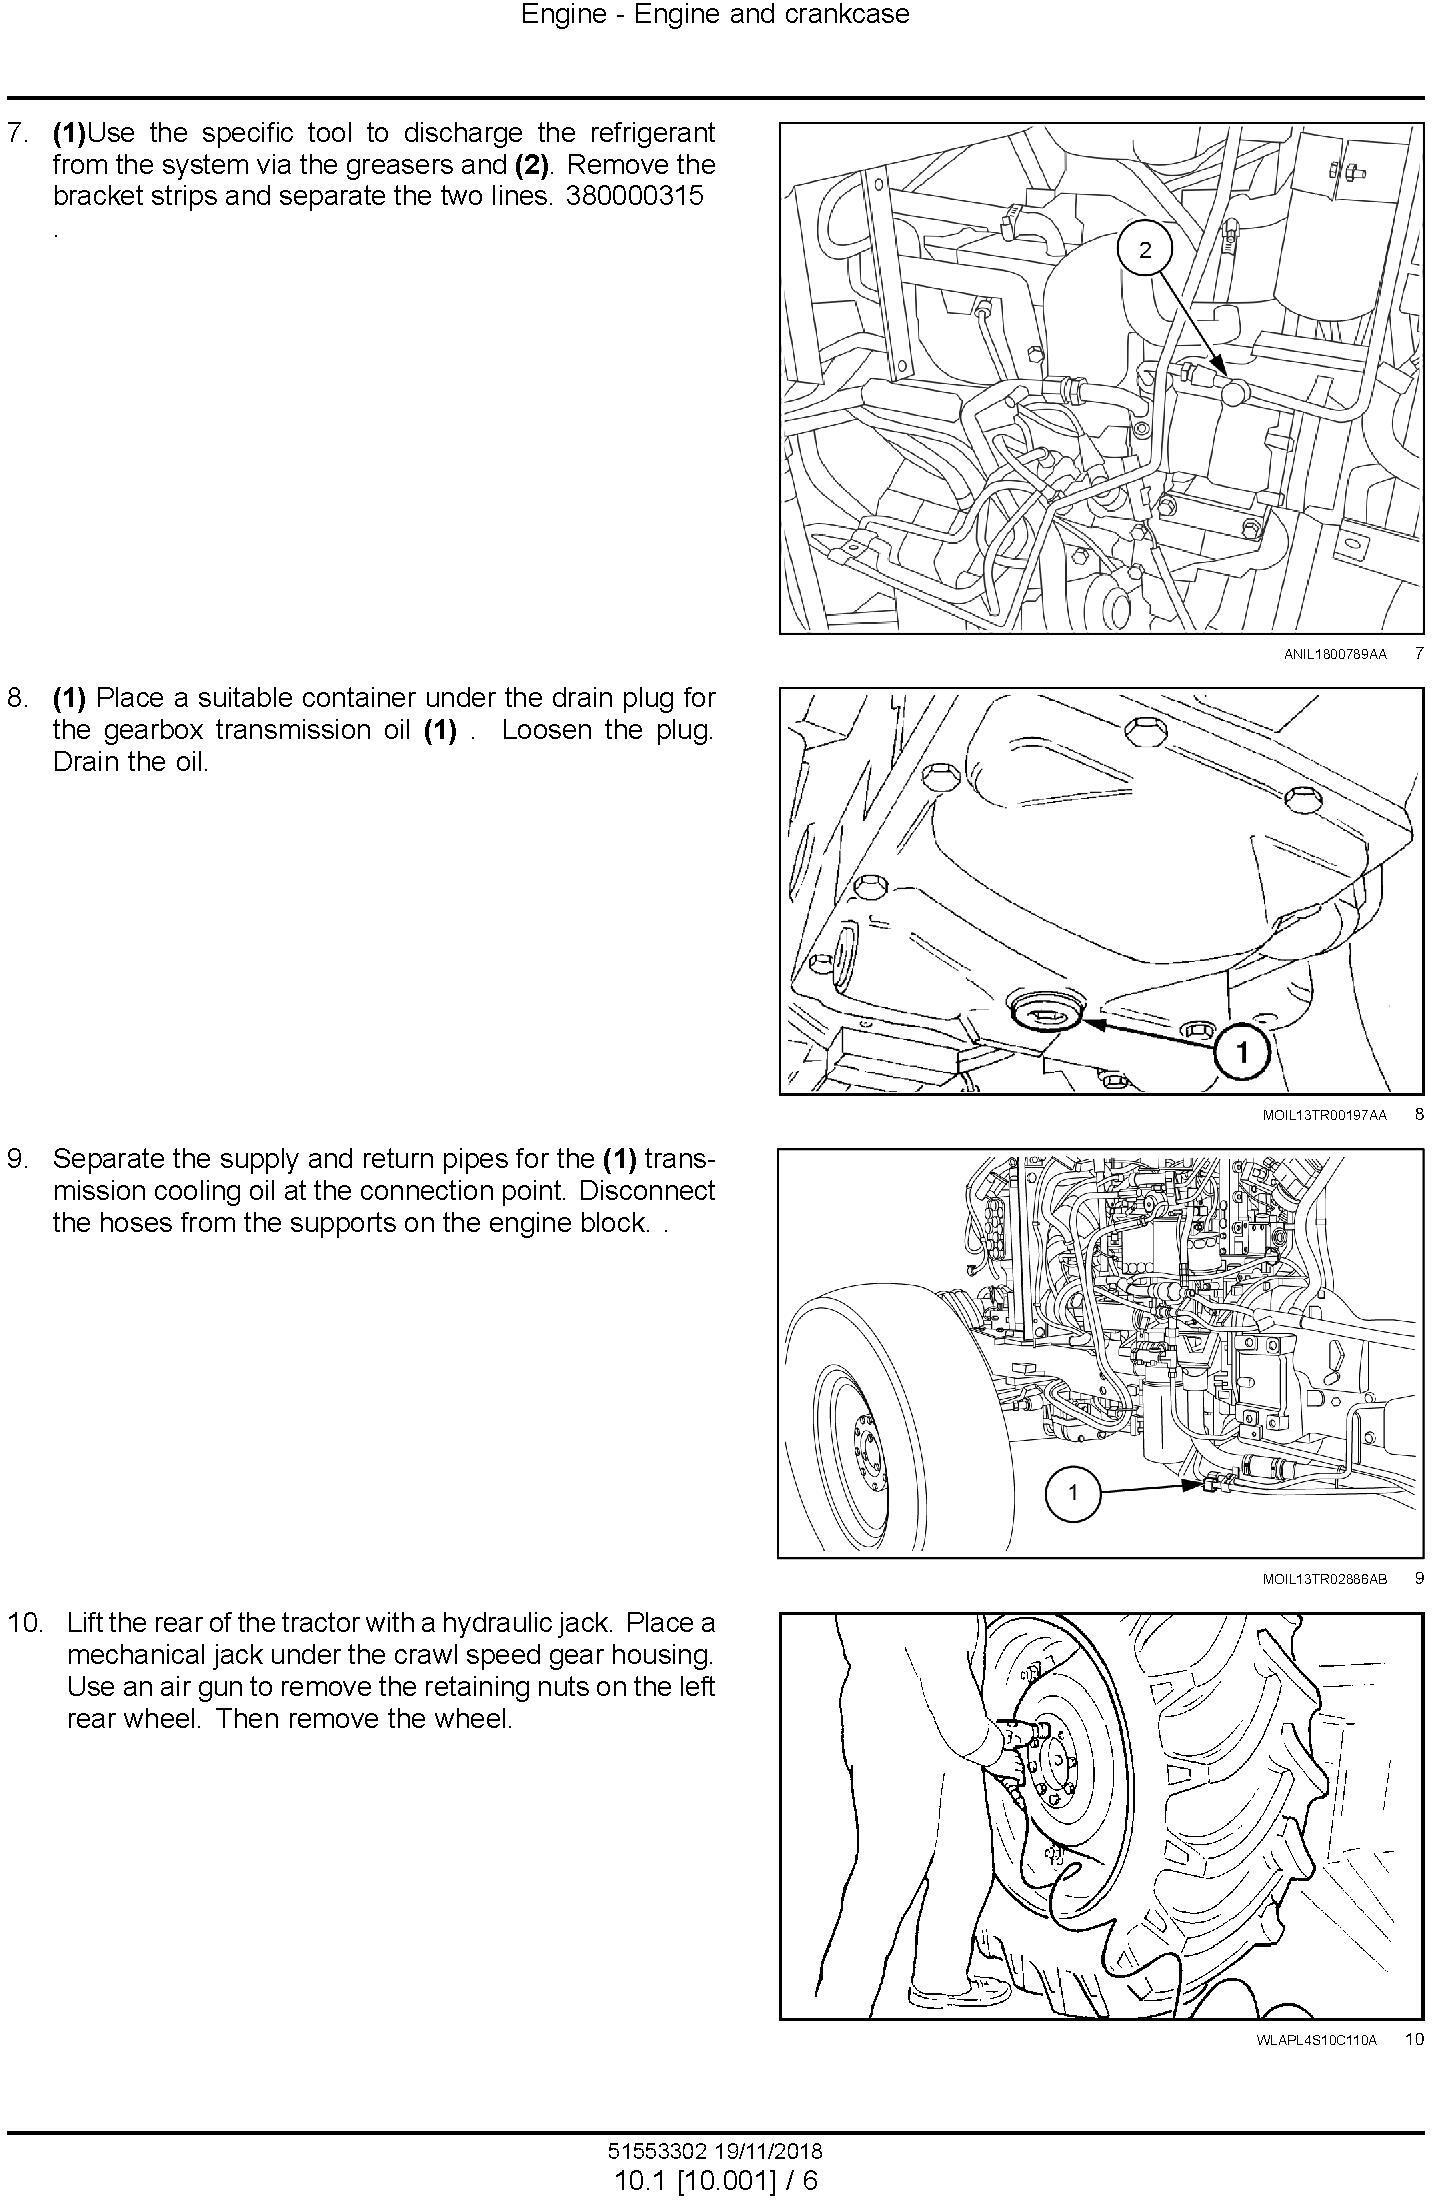 New Holland T3.60F, T3.70F, T3.80F Tractor Service Manual (North America) - 1